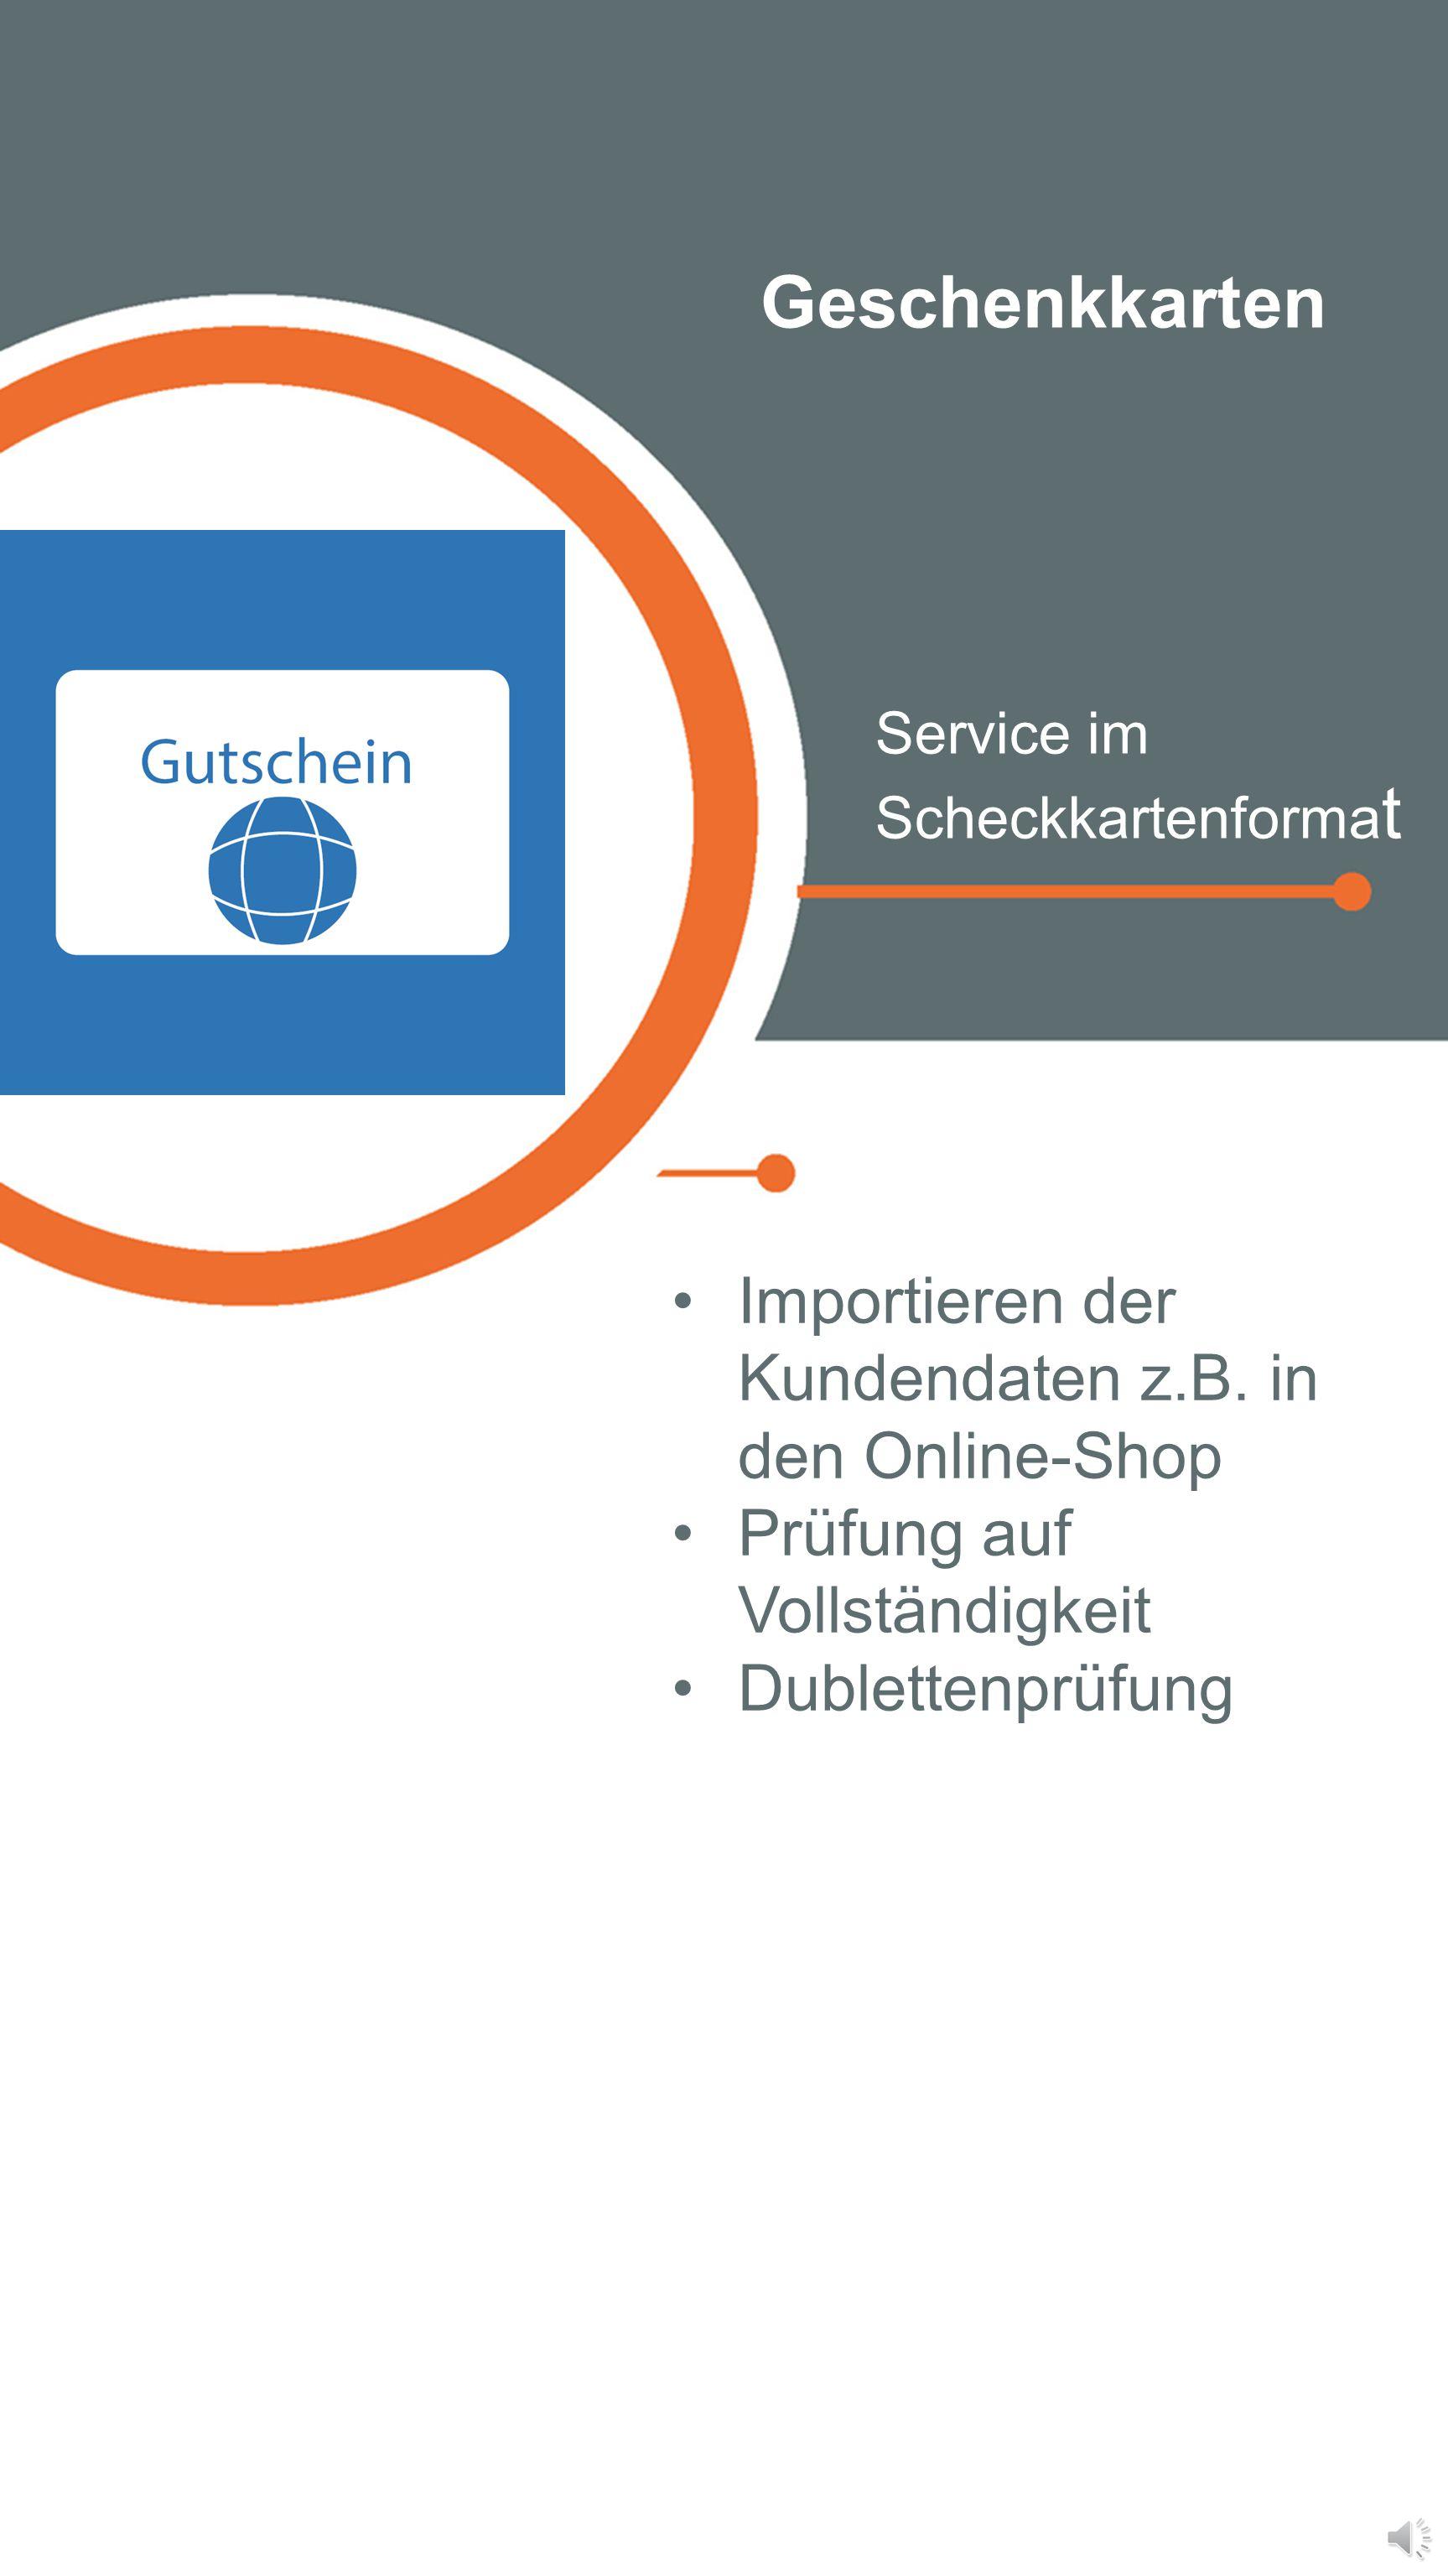 Geschenkkarten Importieren der Kundendaten z.B. in den Online-Shop